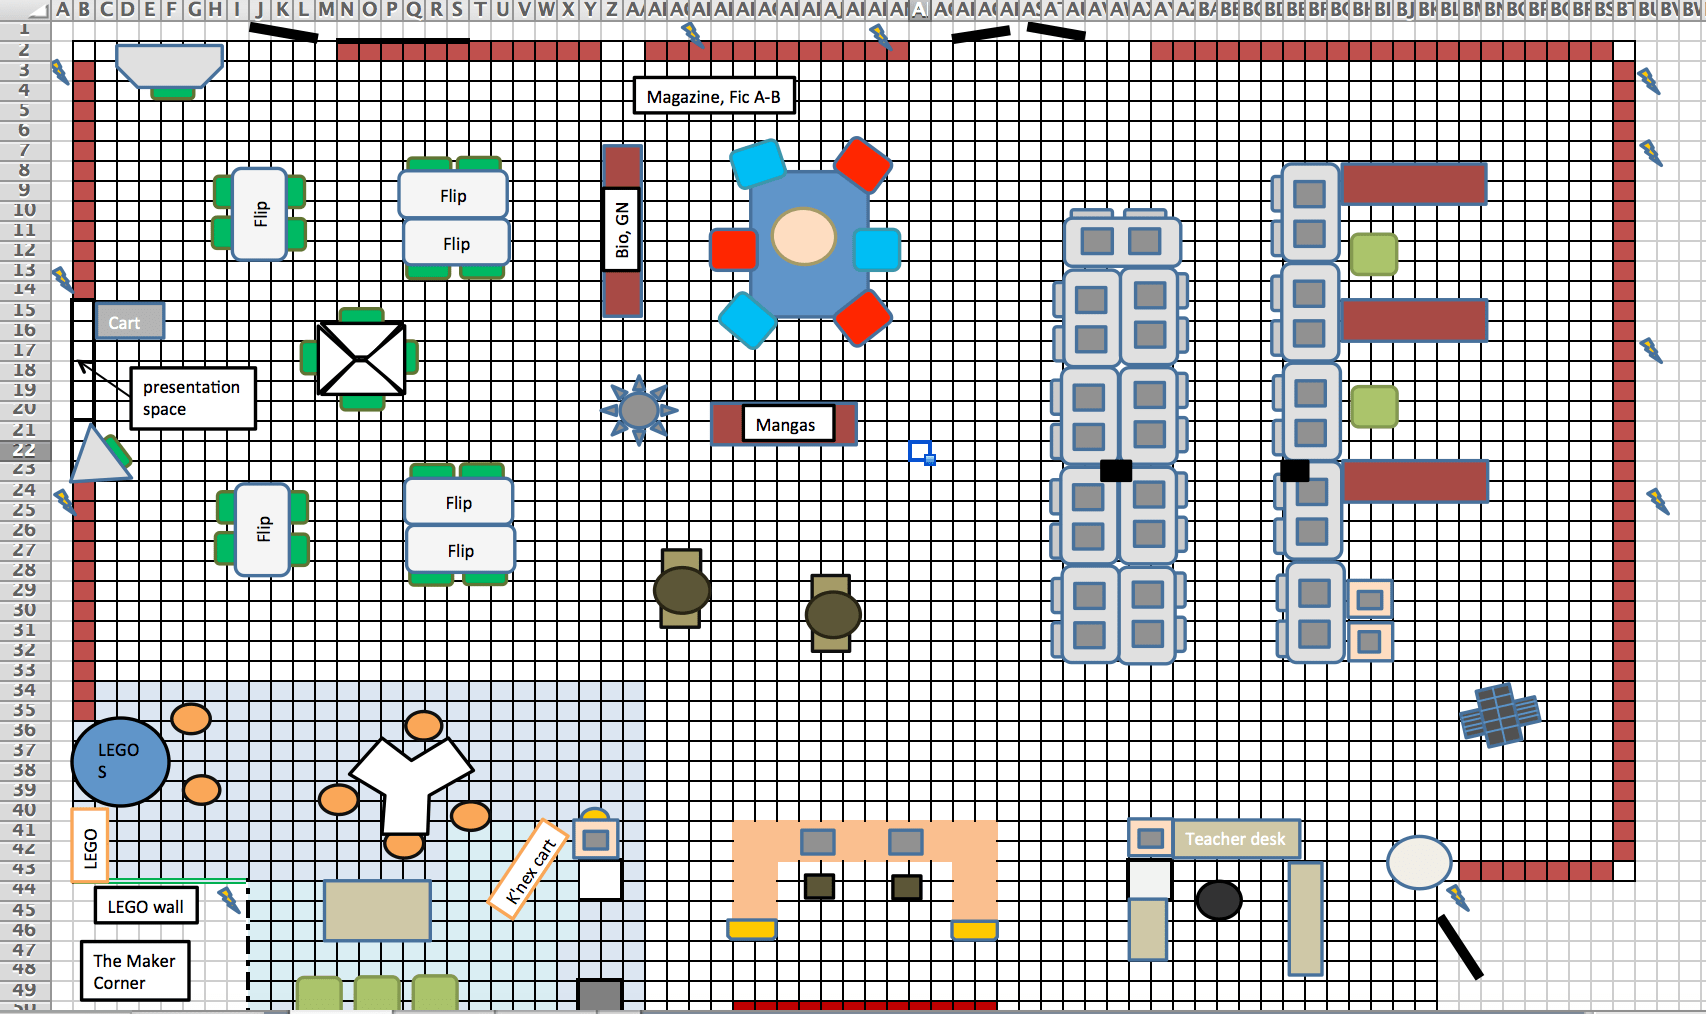 visio kitchen stencils membrane systems for wastewater treatment visio floor plan template - Visio Kitchen Template